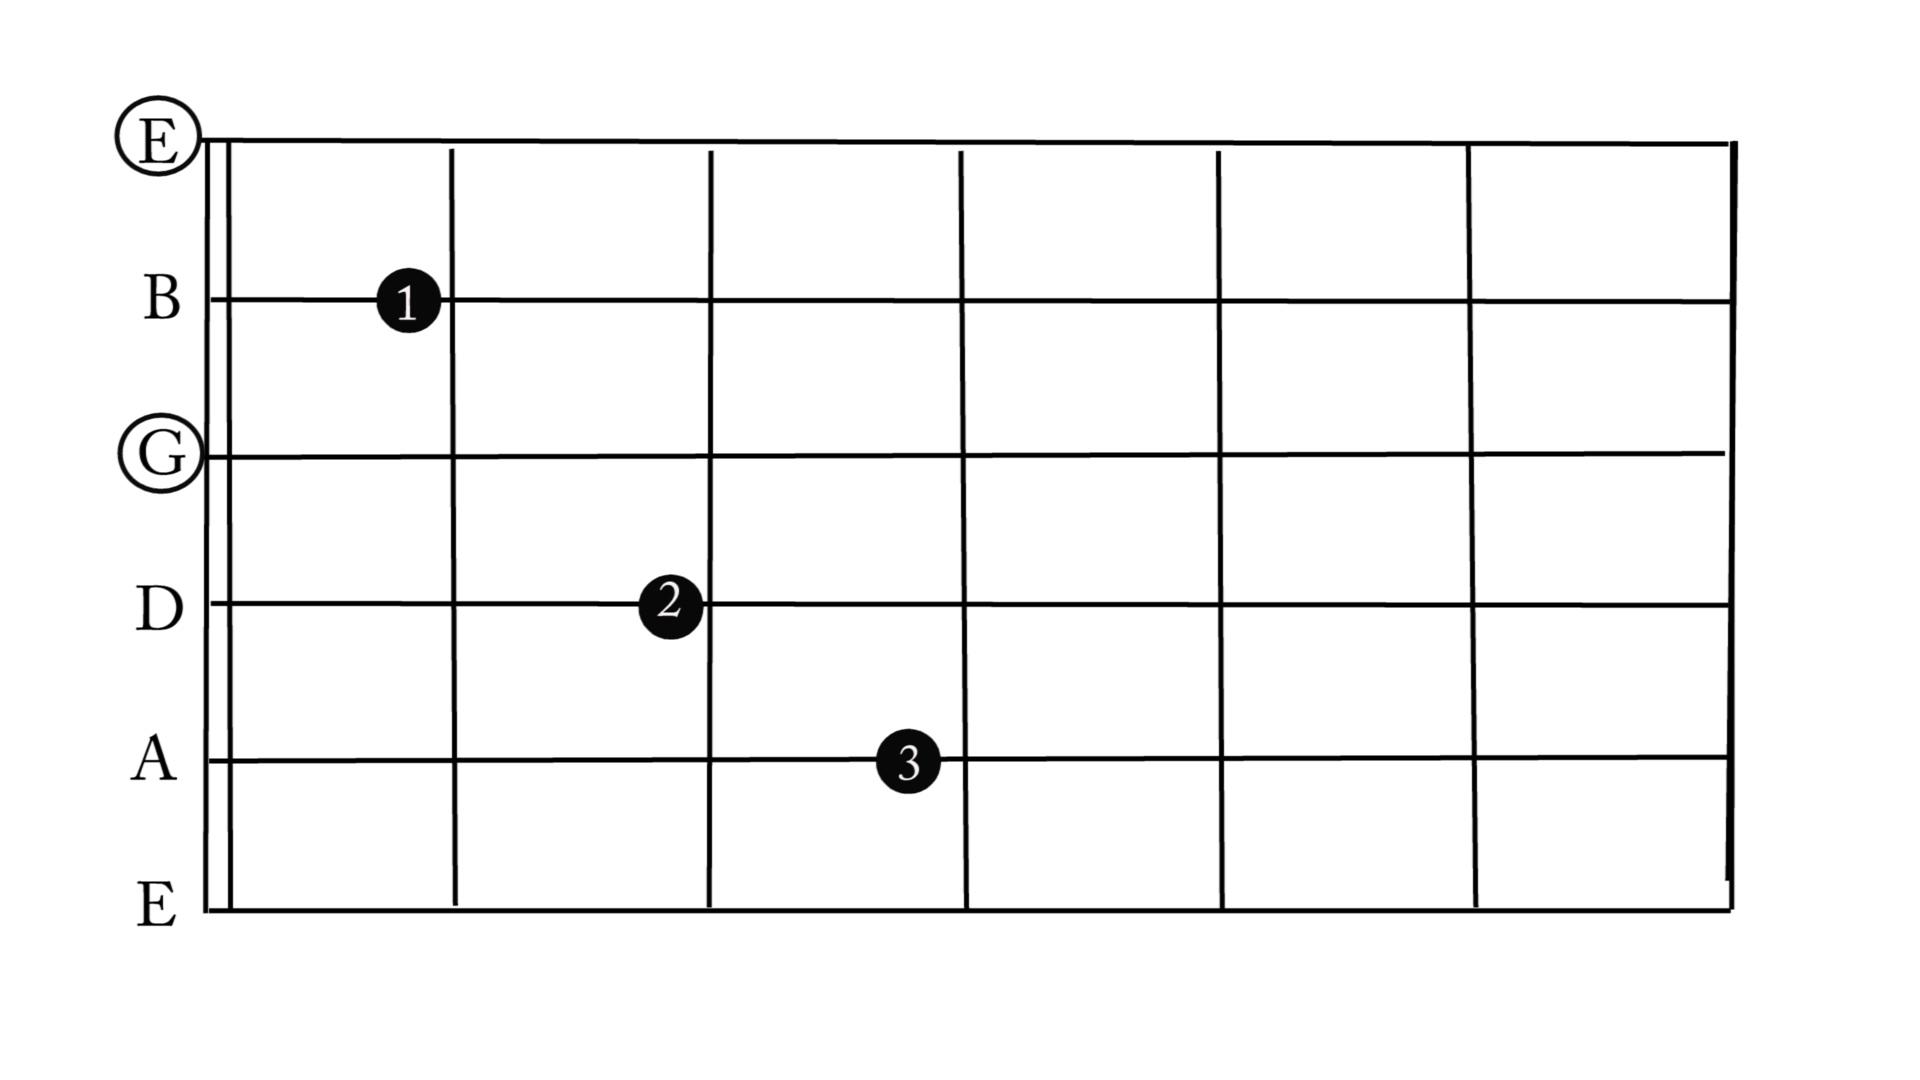 c major and a minor chords center stage guitar academy. Black Bedroom Furniture Sets. Home Design Ideas